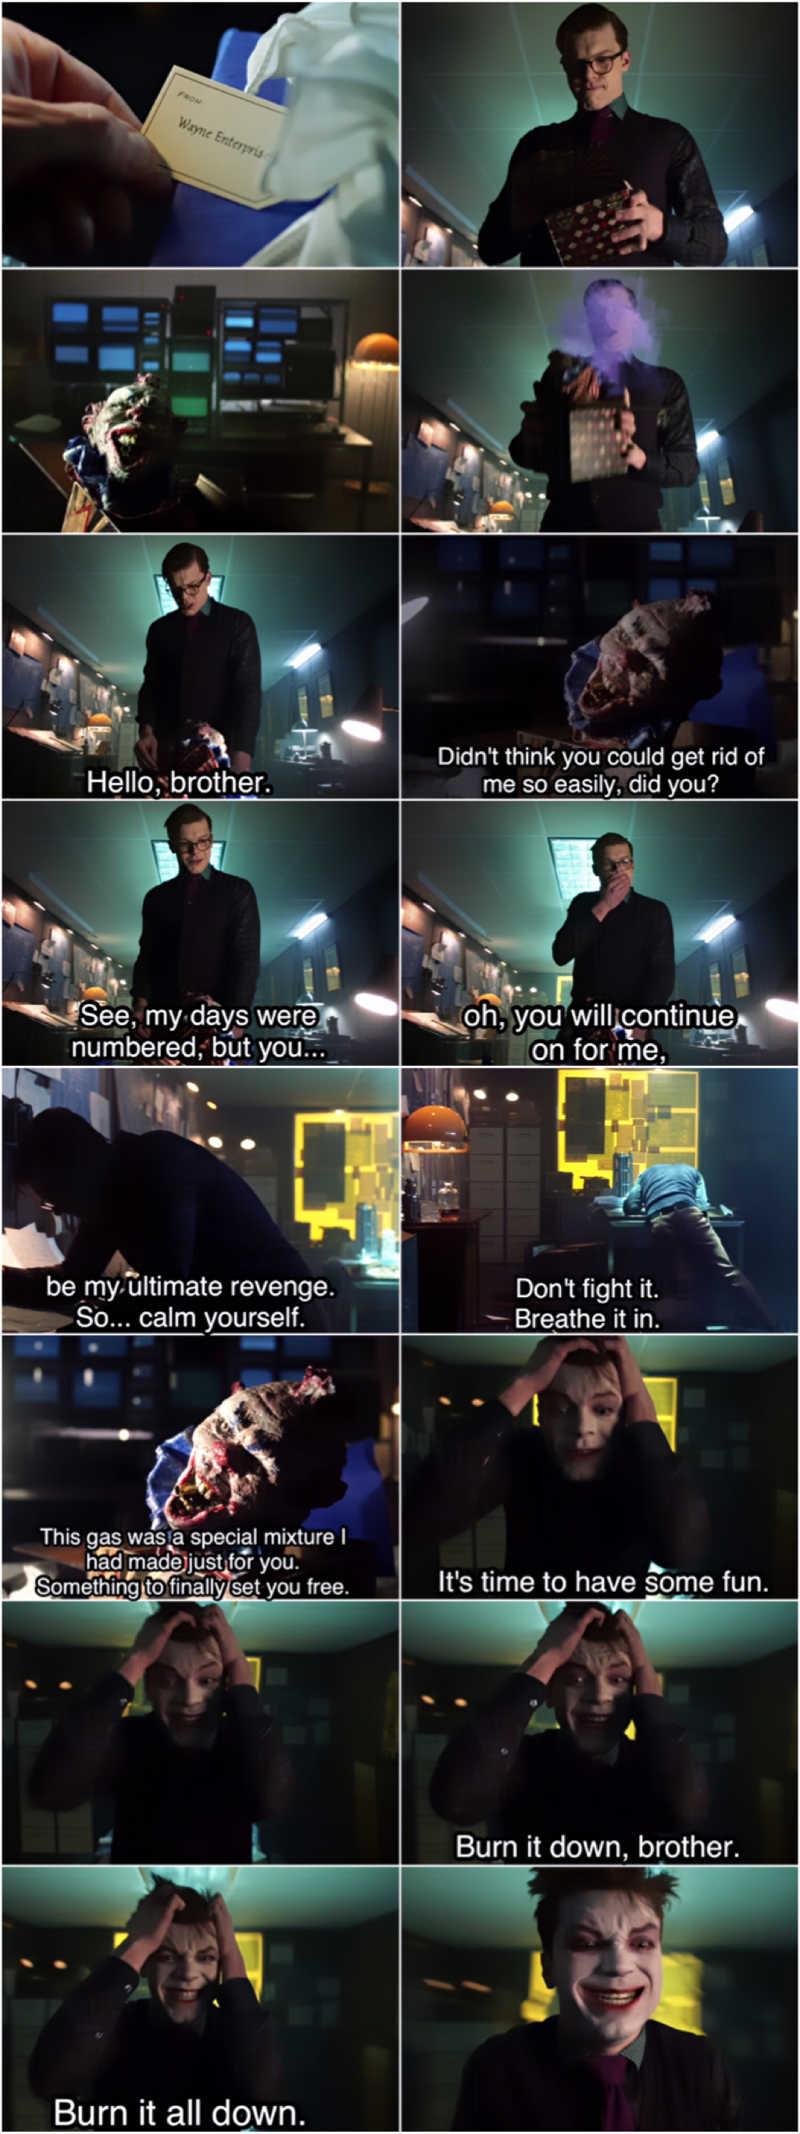 Wow 😵 This scene gave me chills 👏👏 He's hereeeeee 🤡🙌